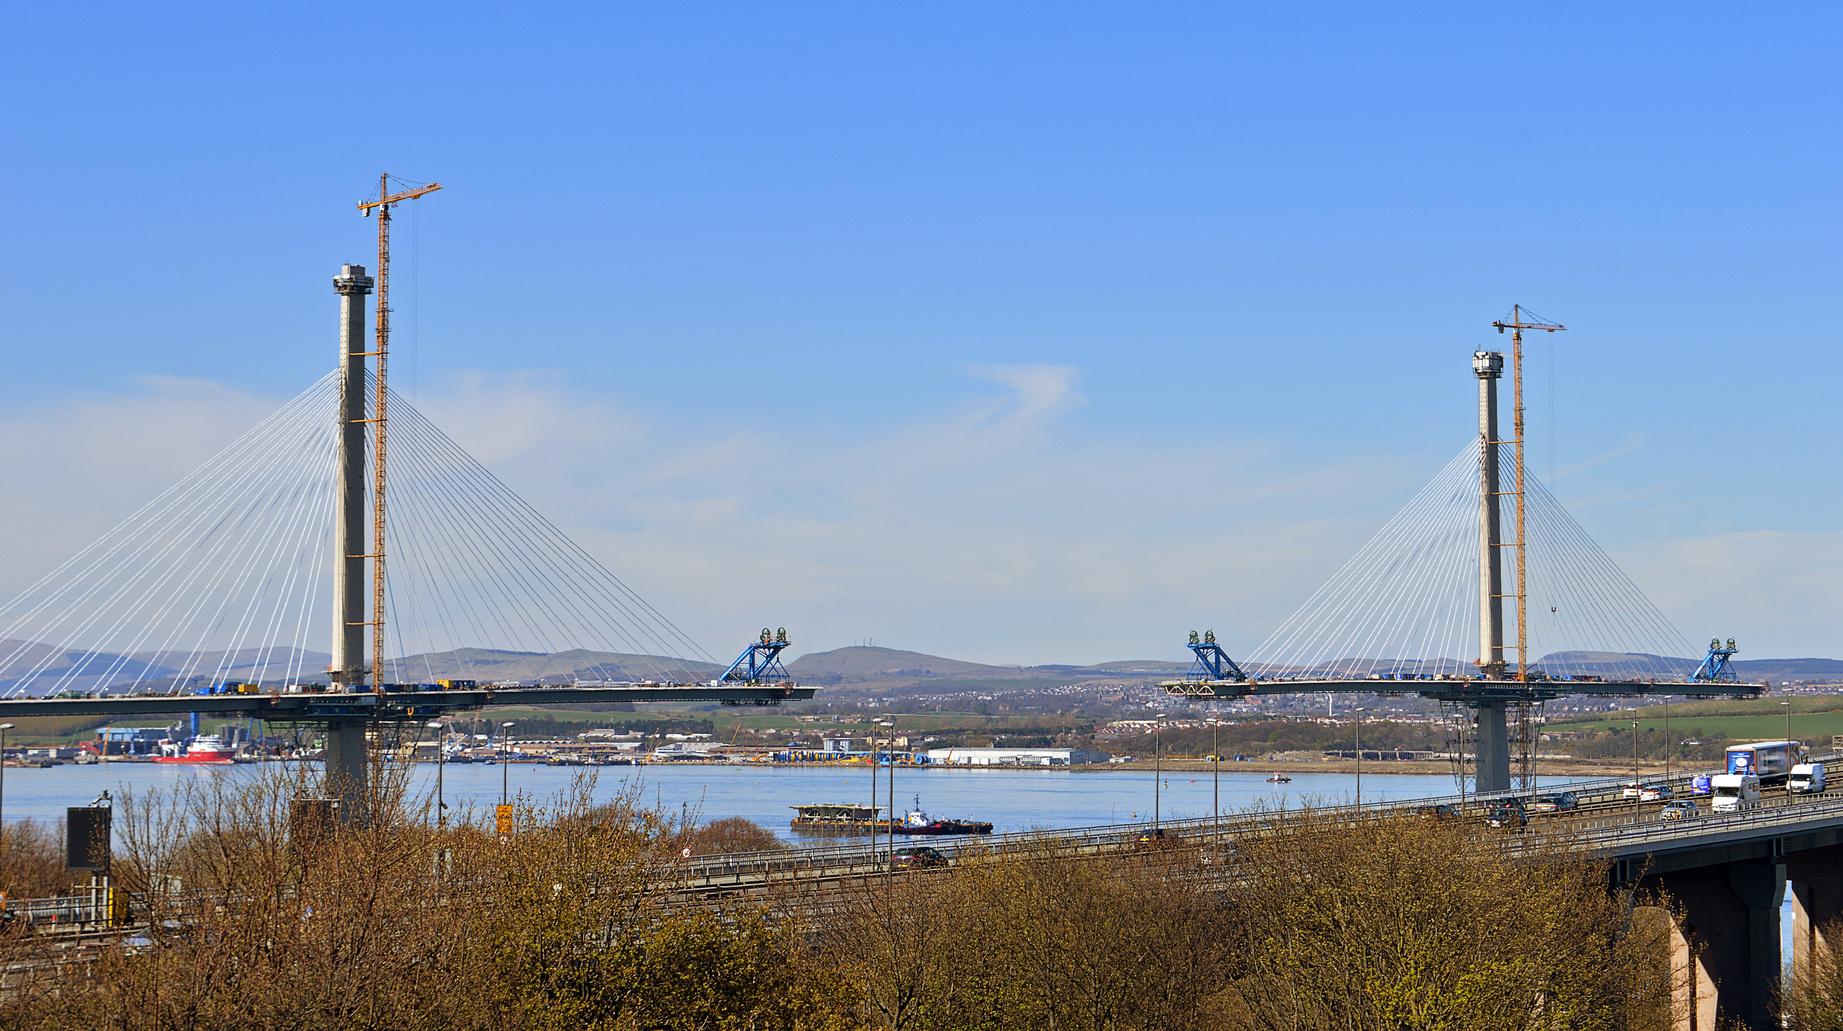 The new Forth Bridge: Queensferry, Edinburgh, Scotland